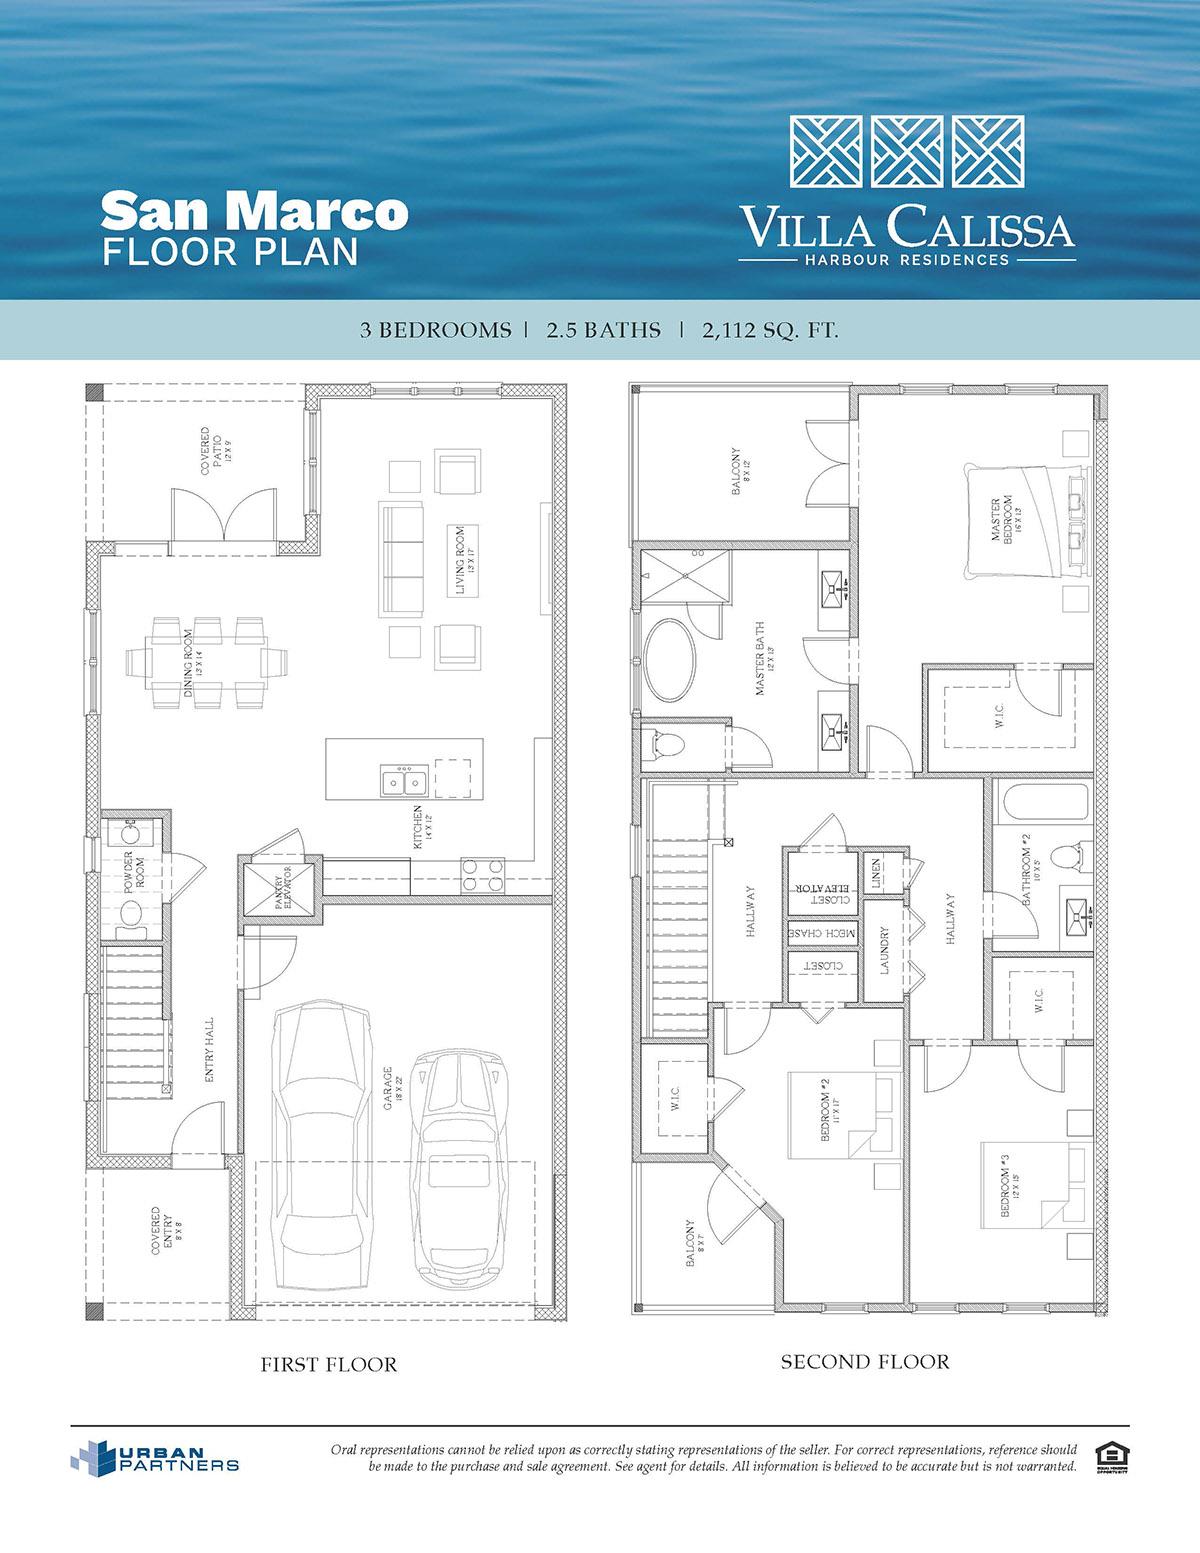 San Marco floor plan at Villa Calissa